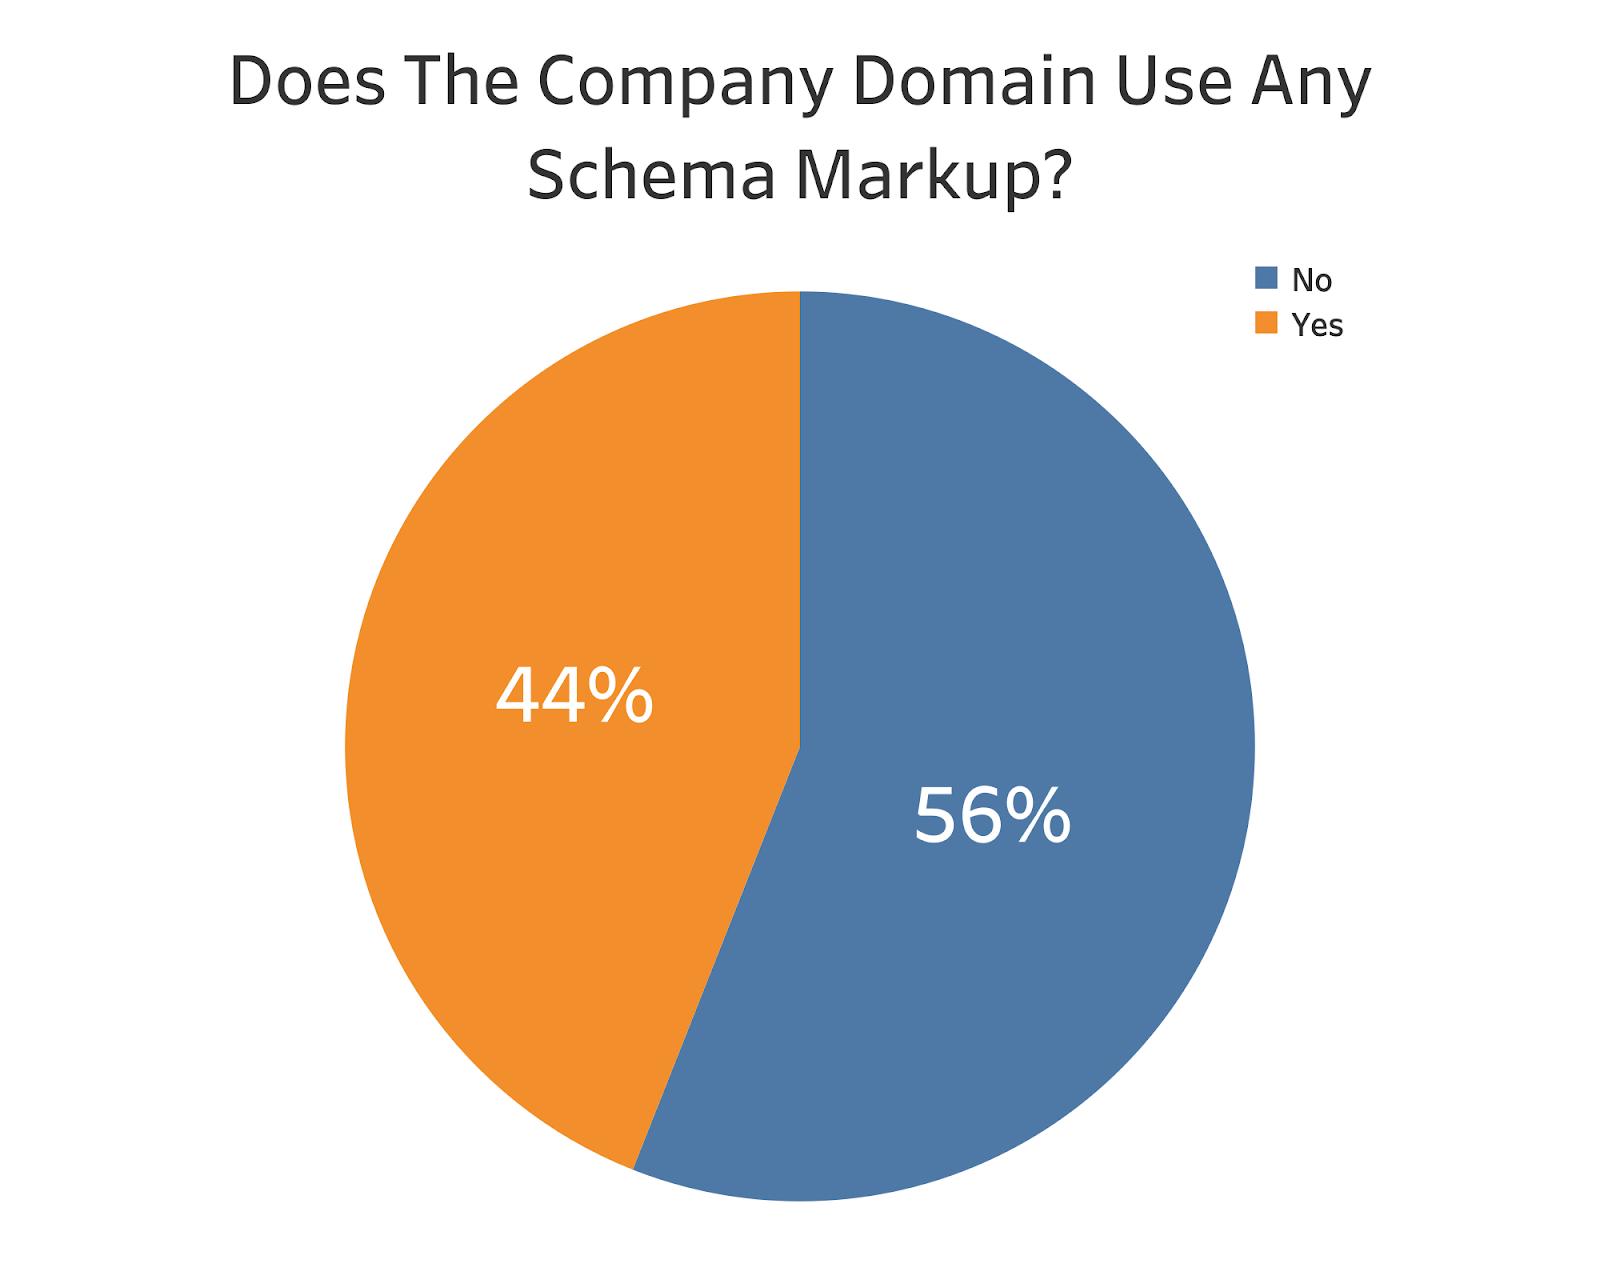 Schema Markup usage by companies